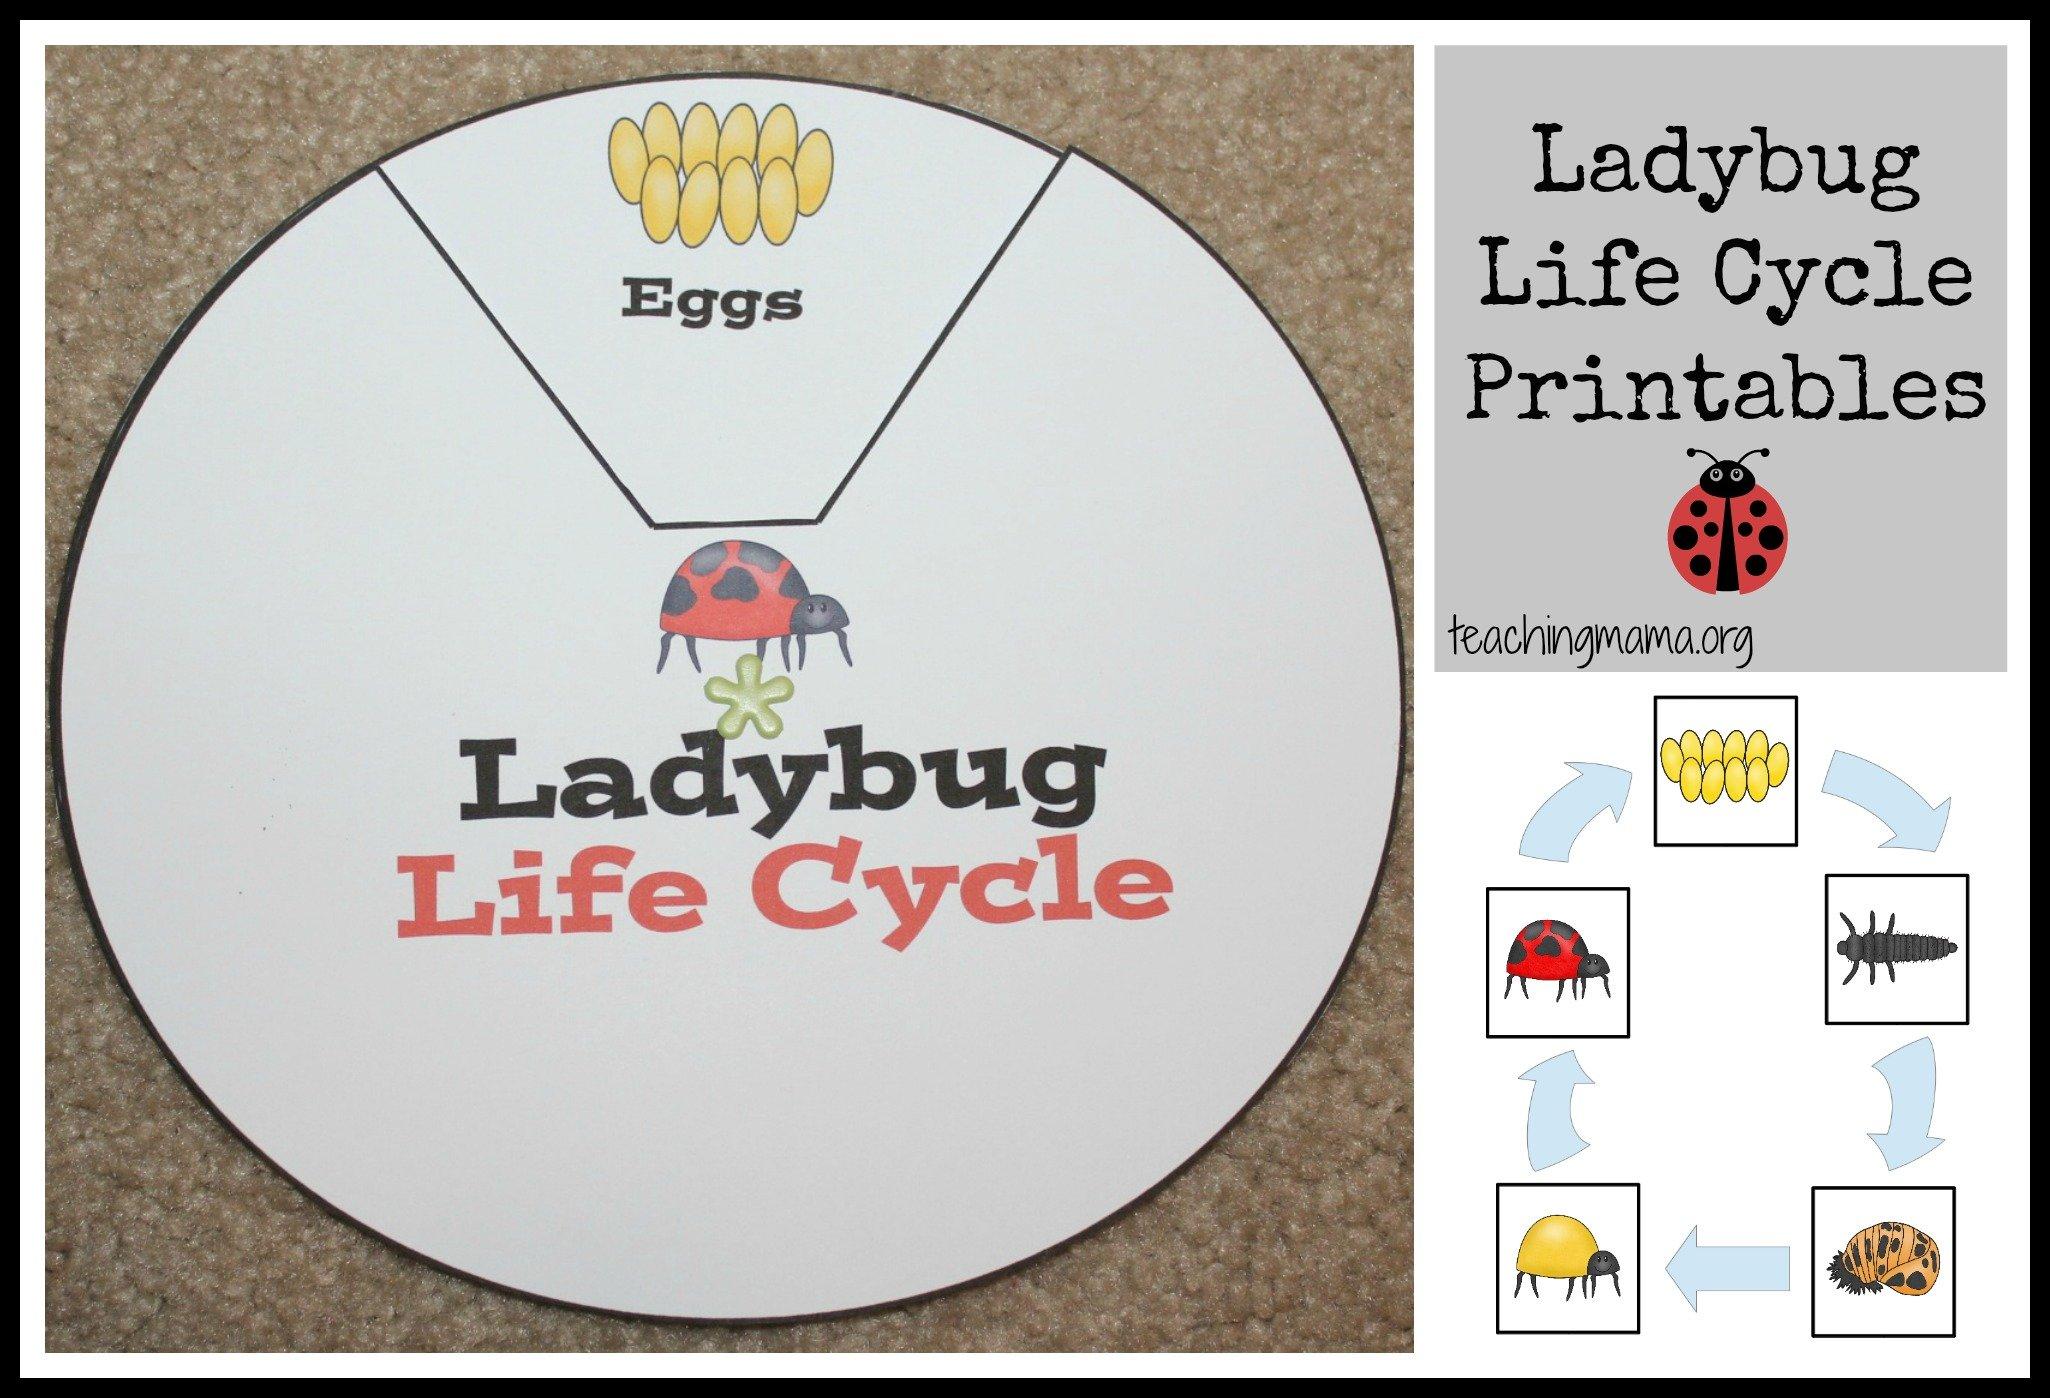 Ladybug Life Cycle Printables furthermore Ladybug Math Printable One More One Less Freebie besides Inside Bin besides Adult as well Ladybug Roll And Cover Math Game. on ladybug life cycle activities sensory